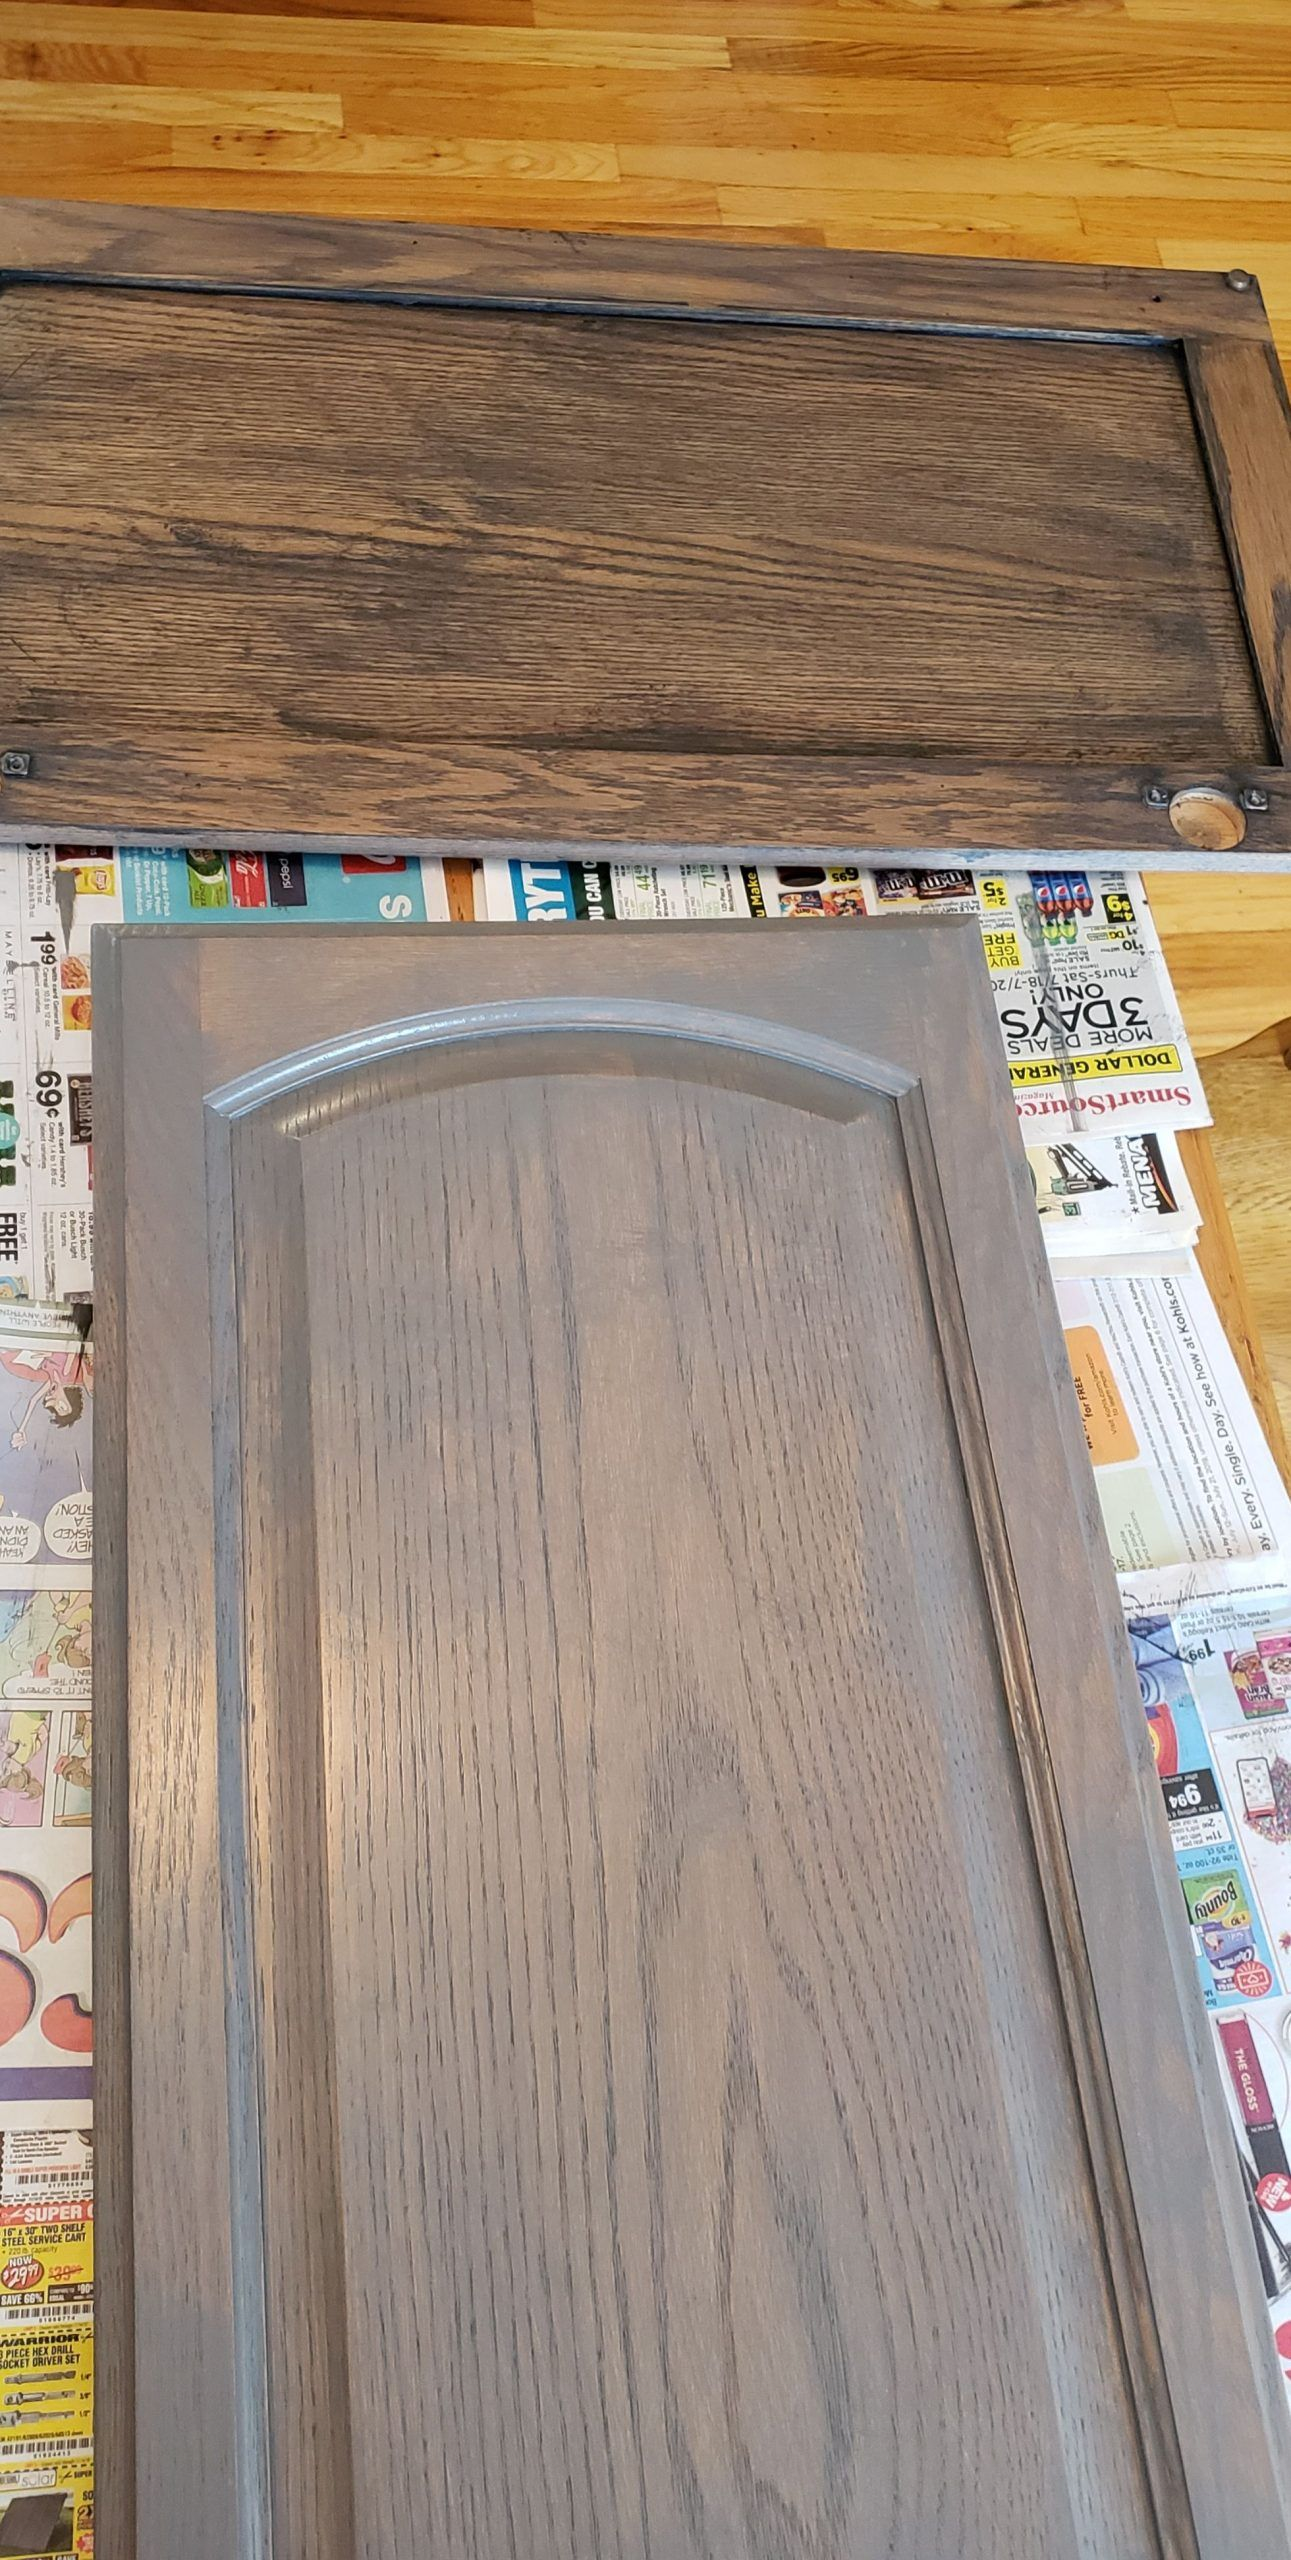 General Finishes Gel Stain On Golden Oak Finishes Gel General Golden Oak Stain In 2020 Staining Oak Cabinets Staining Cabinets Stained Kitchen Cabinets